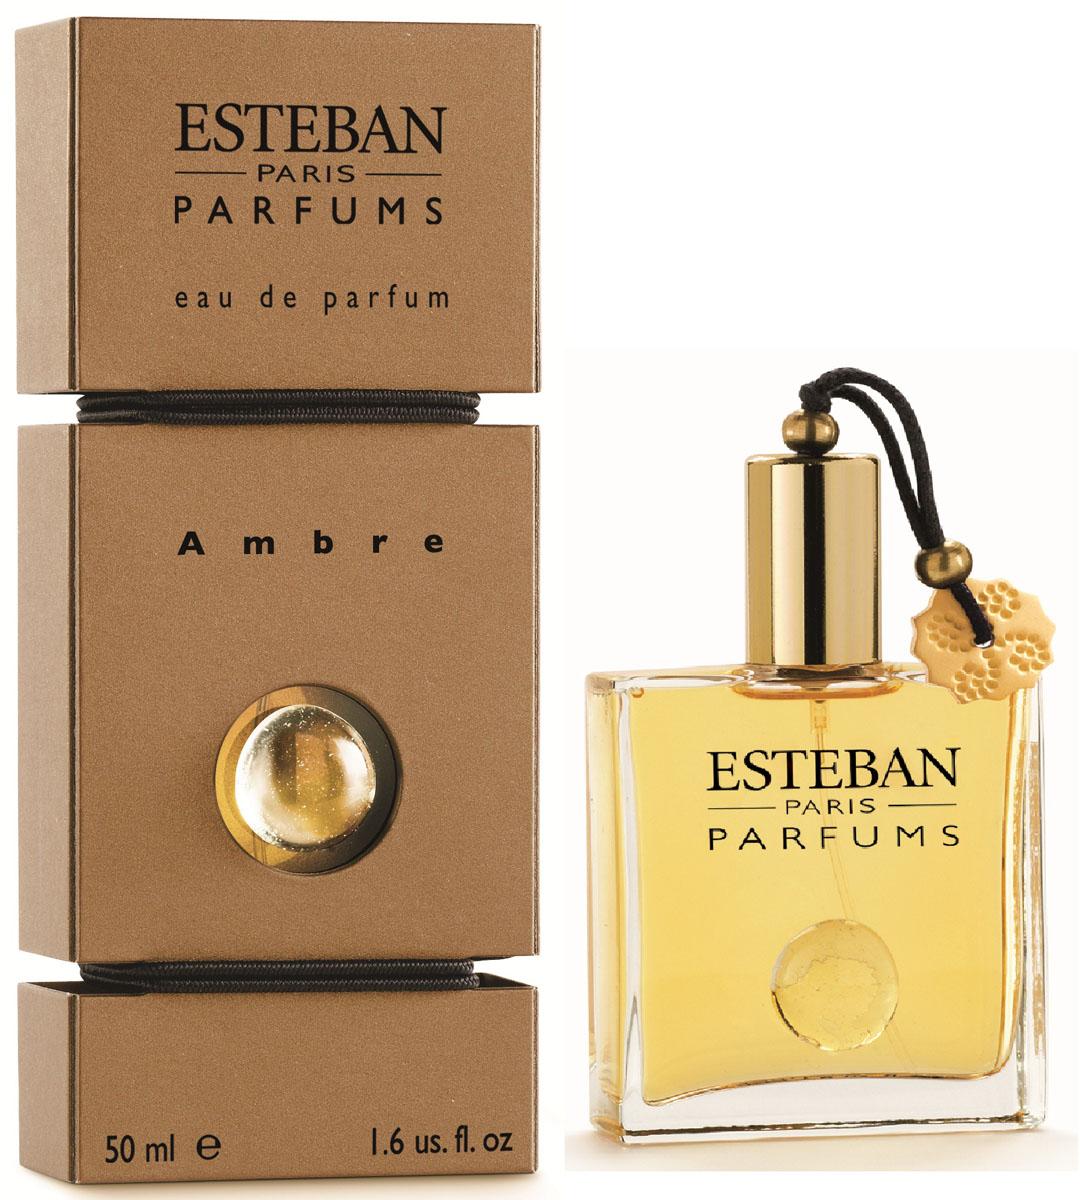 Esteban Collection Les Matieres Парфюмерная вода Ambre 50 млCPA-023